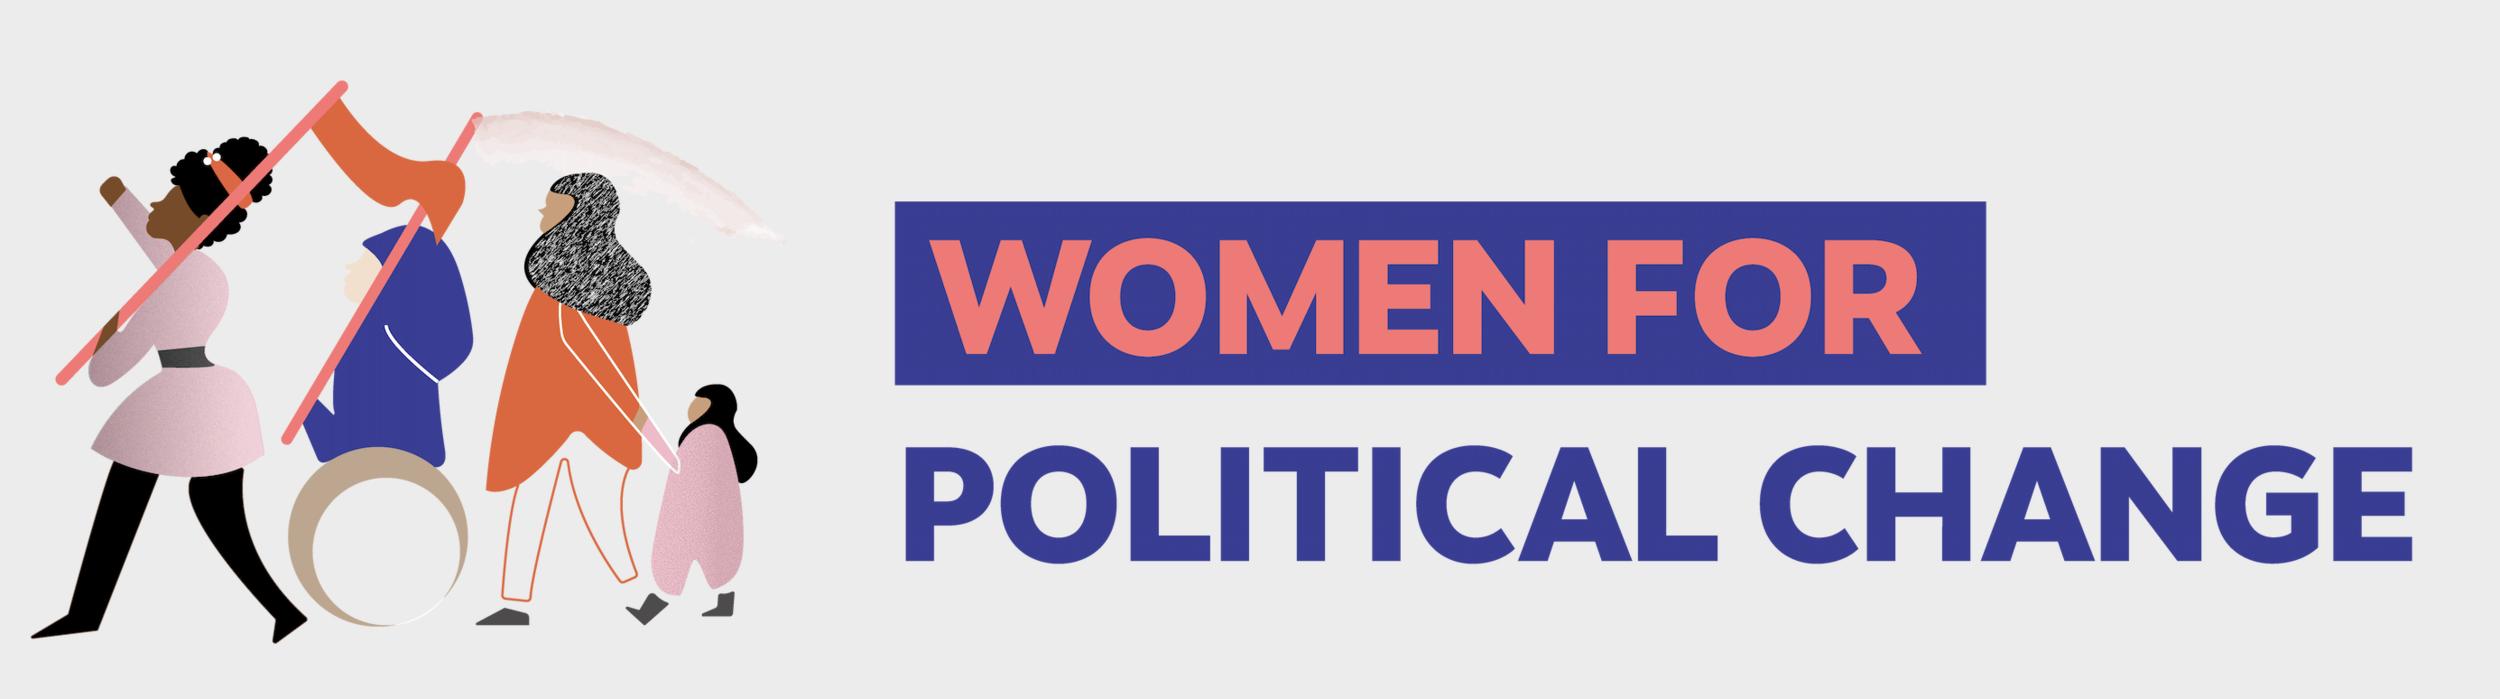 Women For Political Change